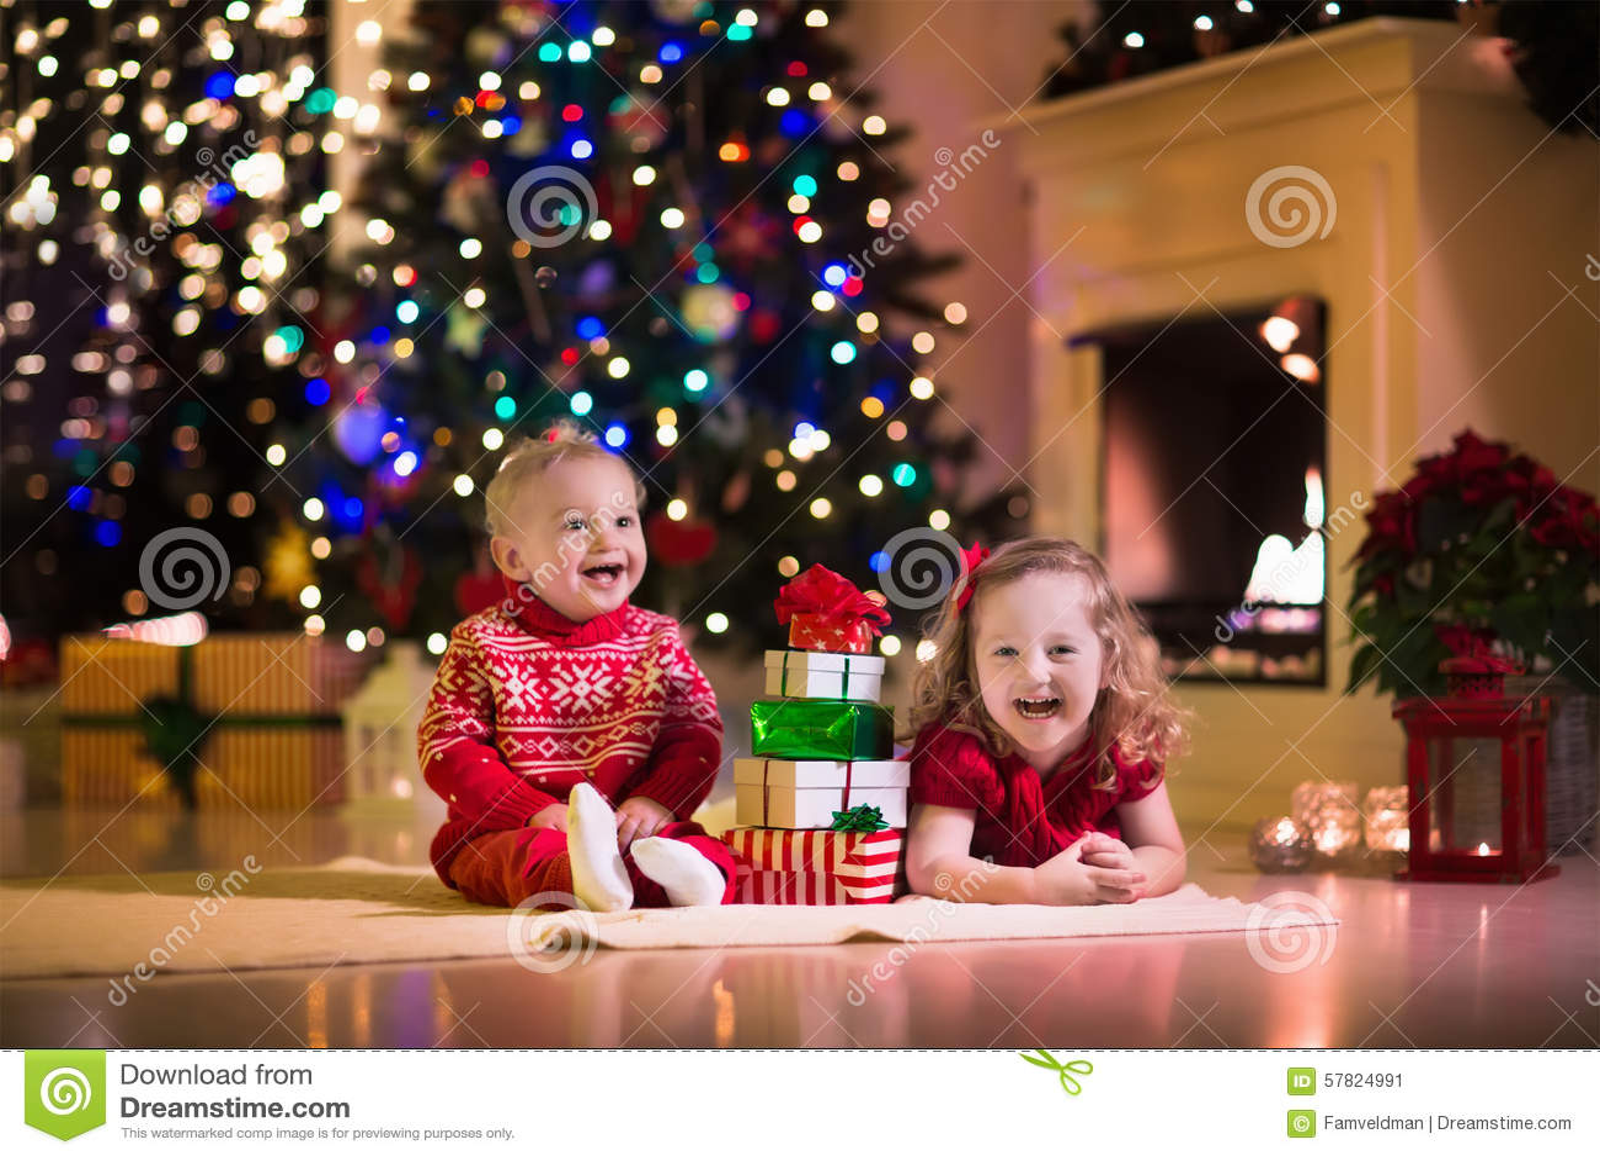 christmas eve opening hours 2018 mcdonalds